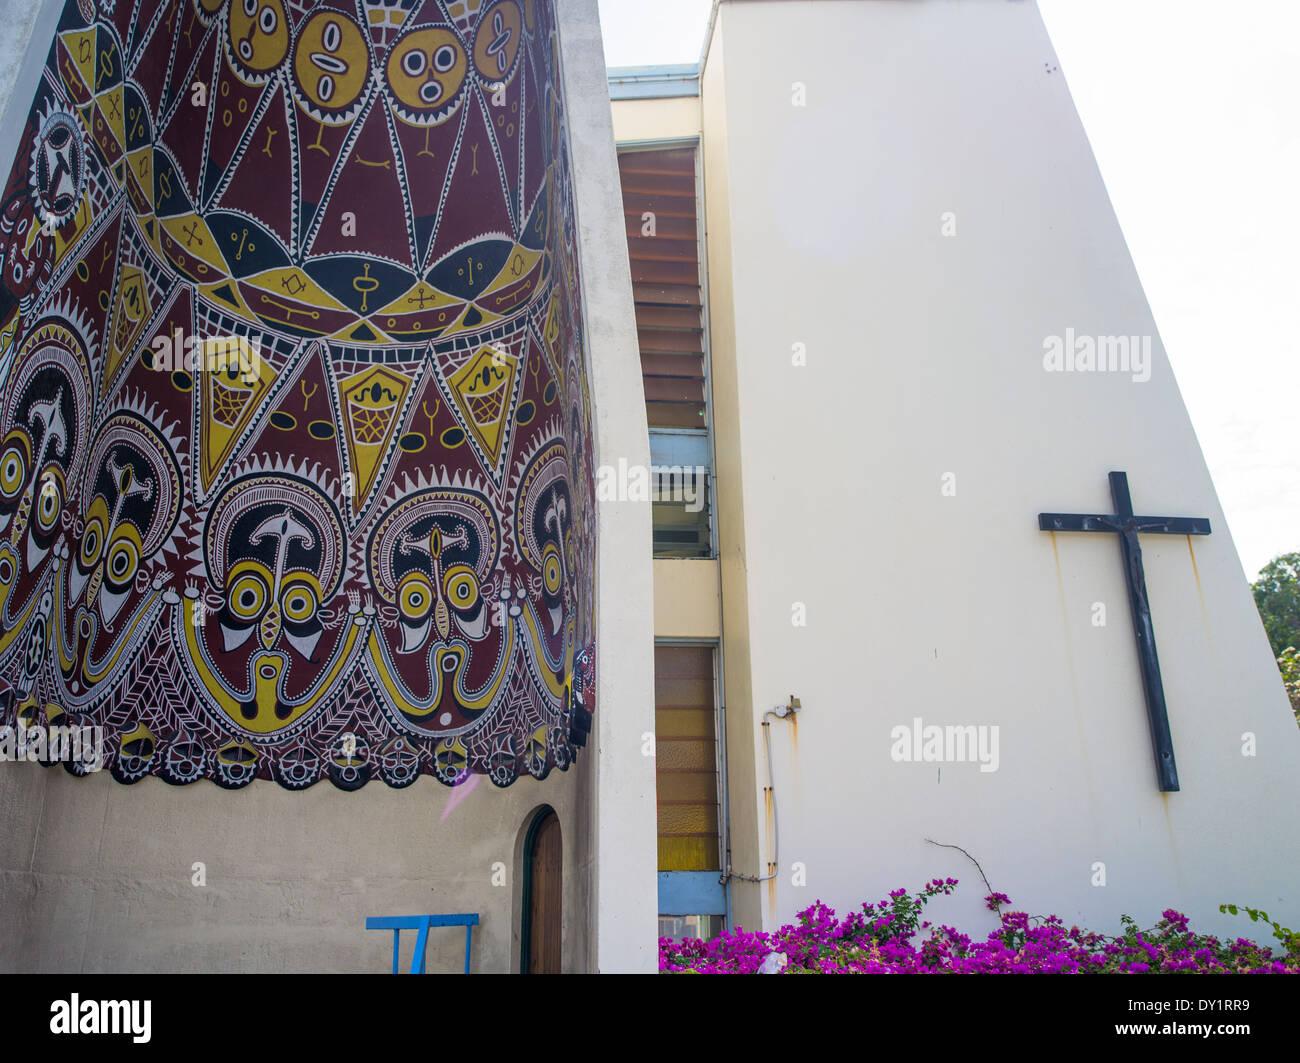 Str. Marys katholische Kirche mit Eingangsportal im Stil der Sepik Haus Tambaran, Port Moresby. Papua-Neu-Guinea Stockbild